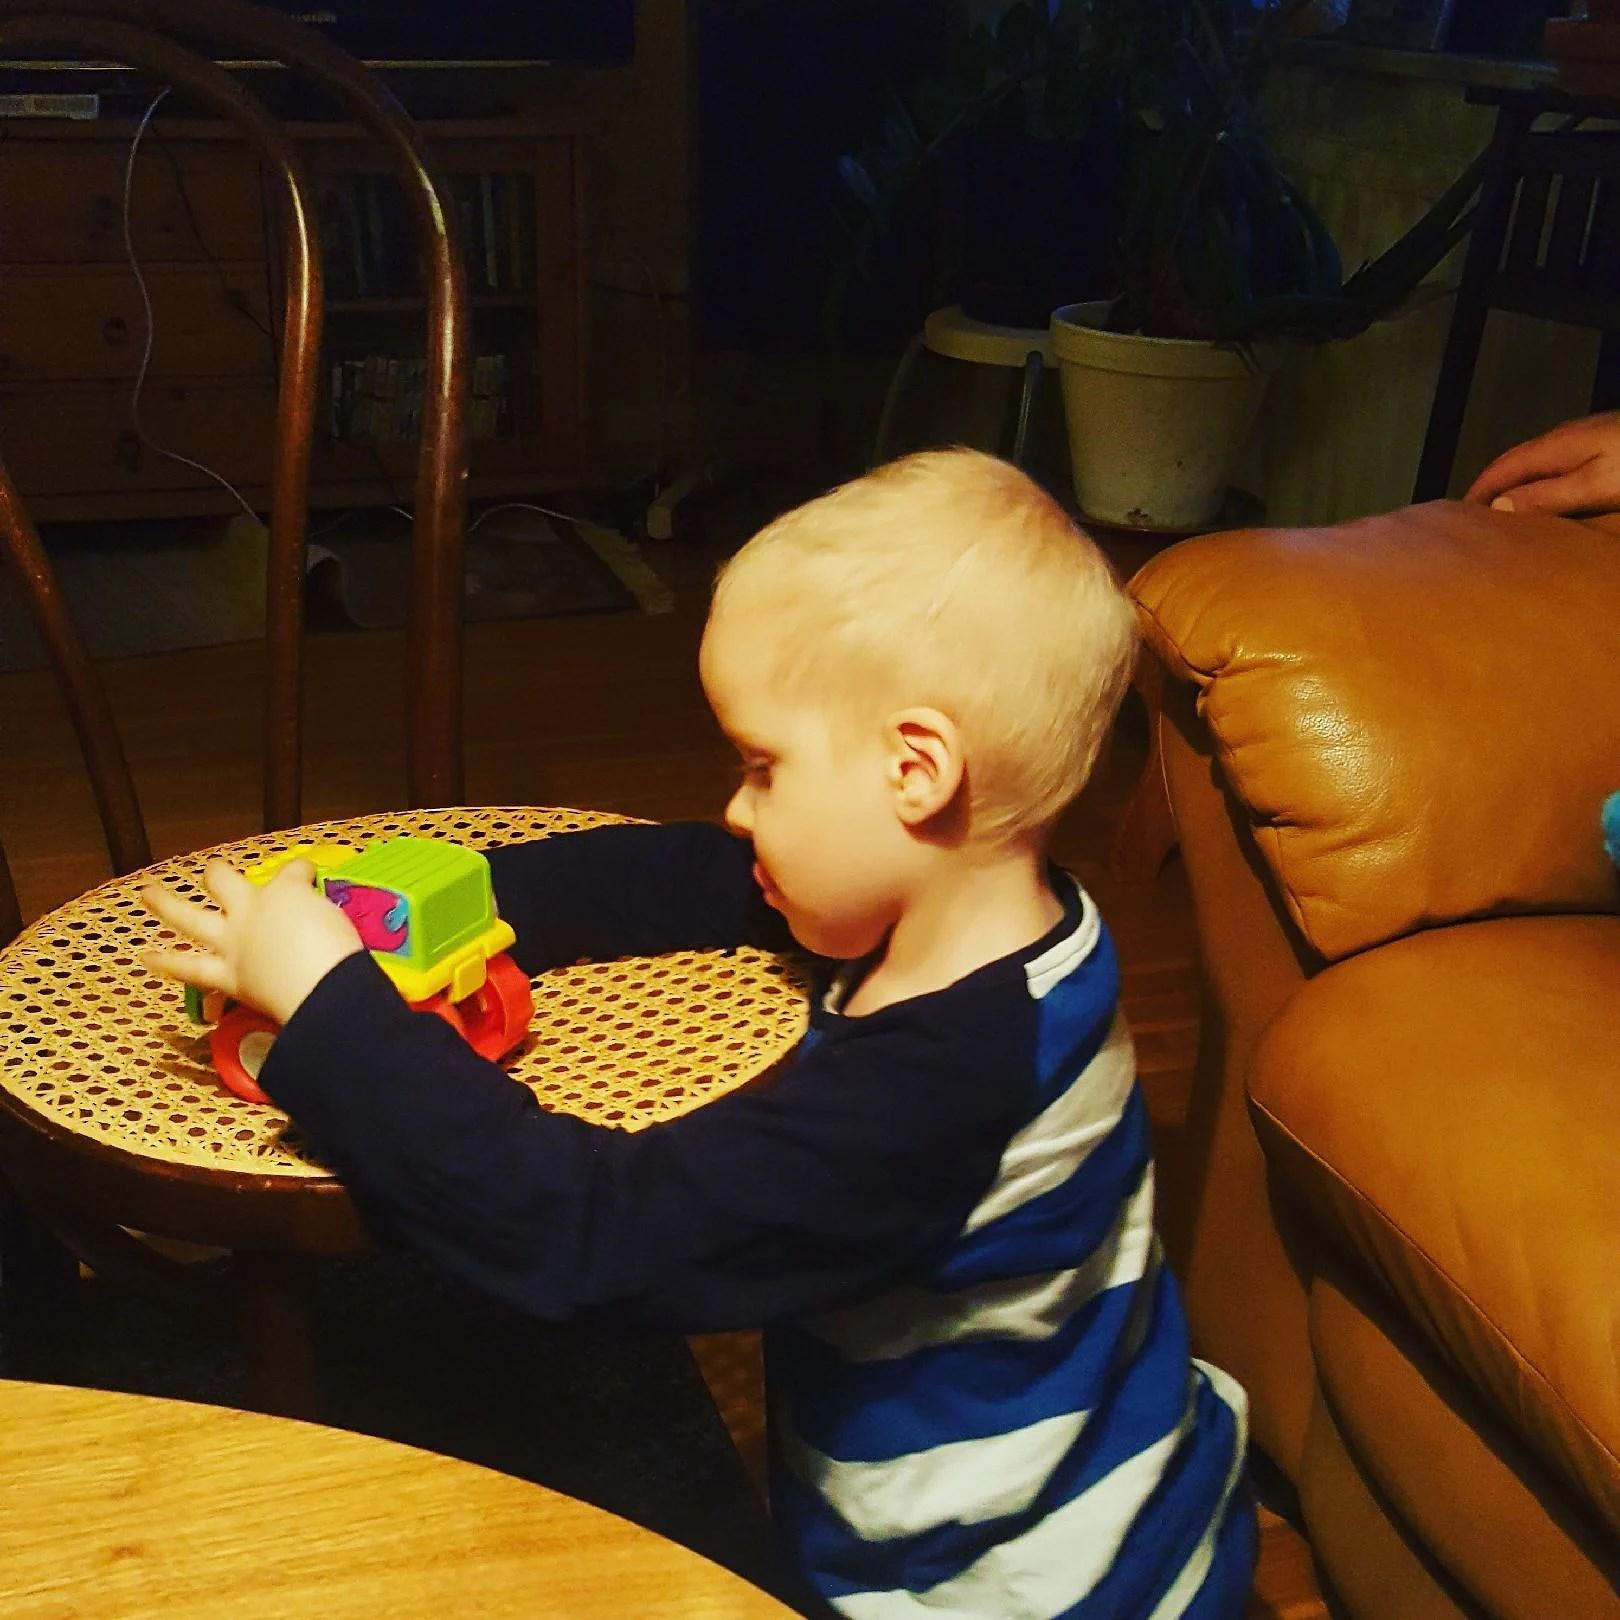 Firat barnens farfar